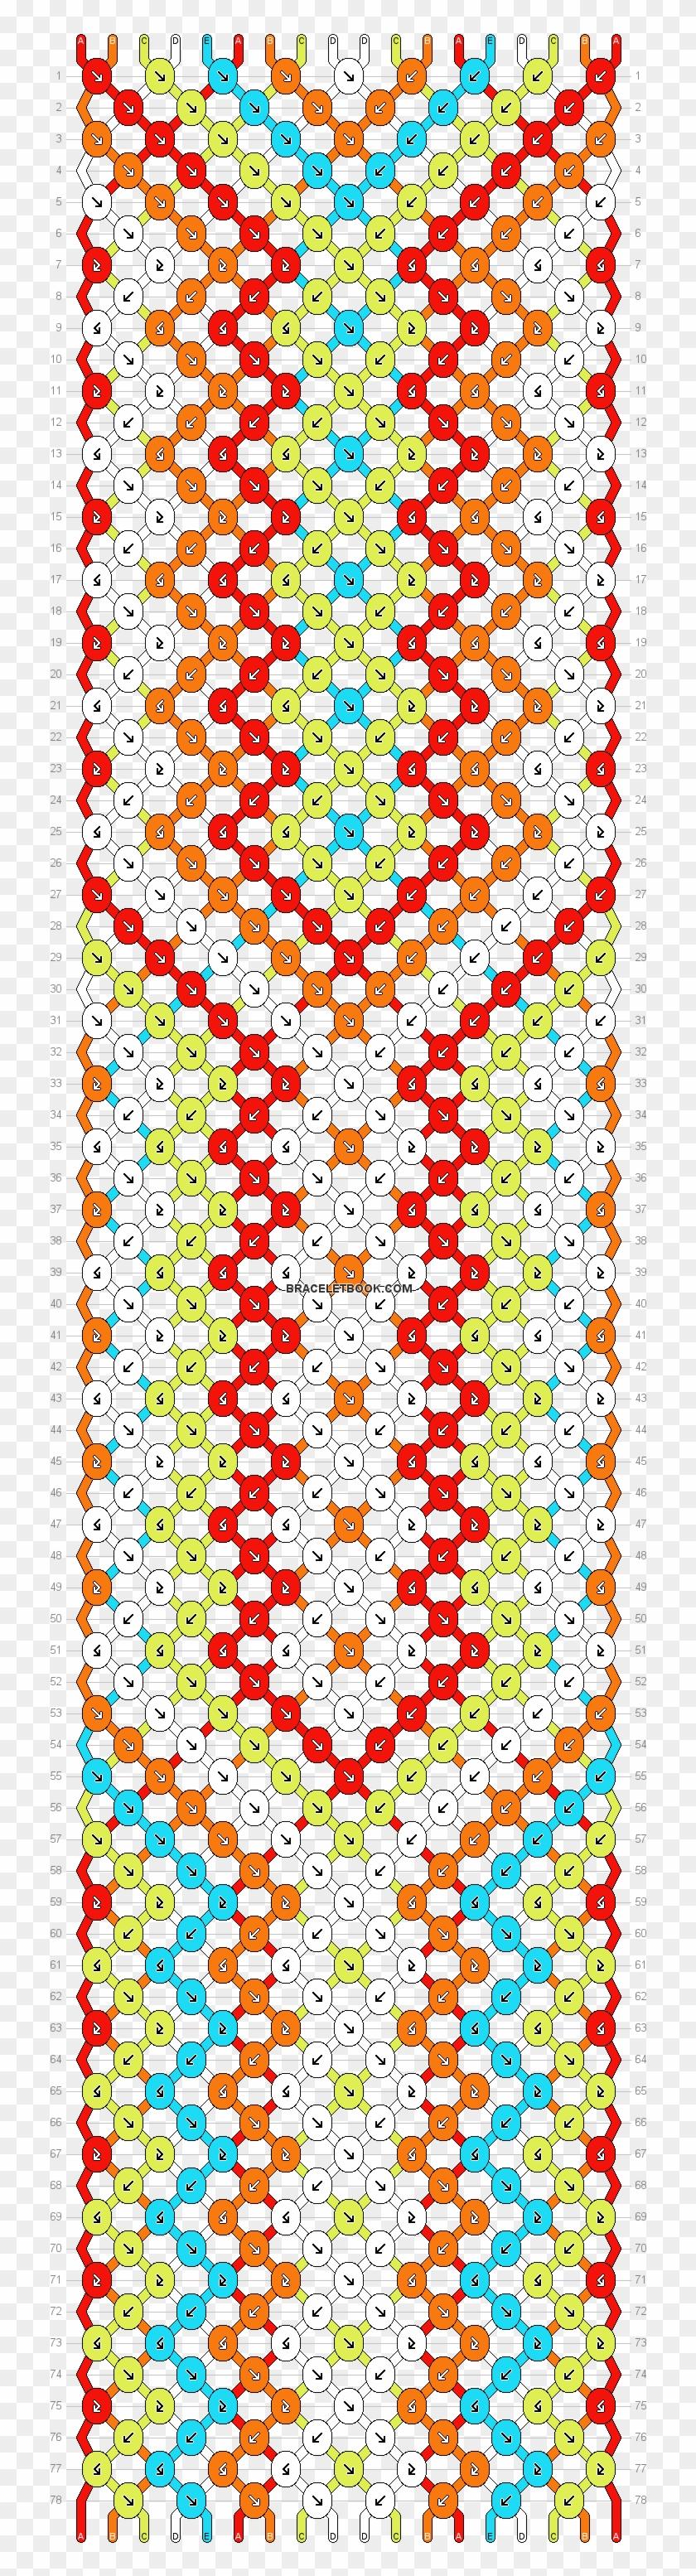 Normal Pattern Hardest Friendship Bracelet Patterns Clipart 1822750 Pikpng